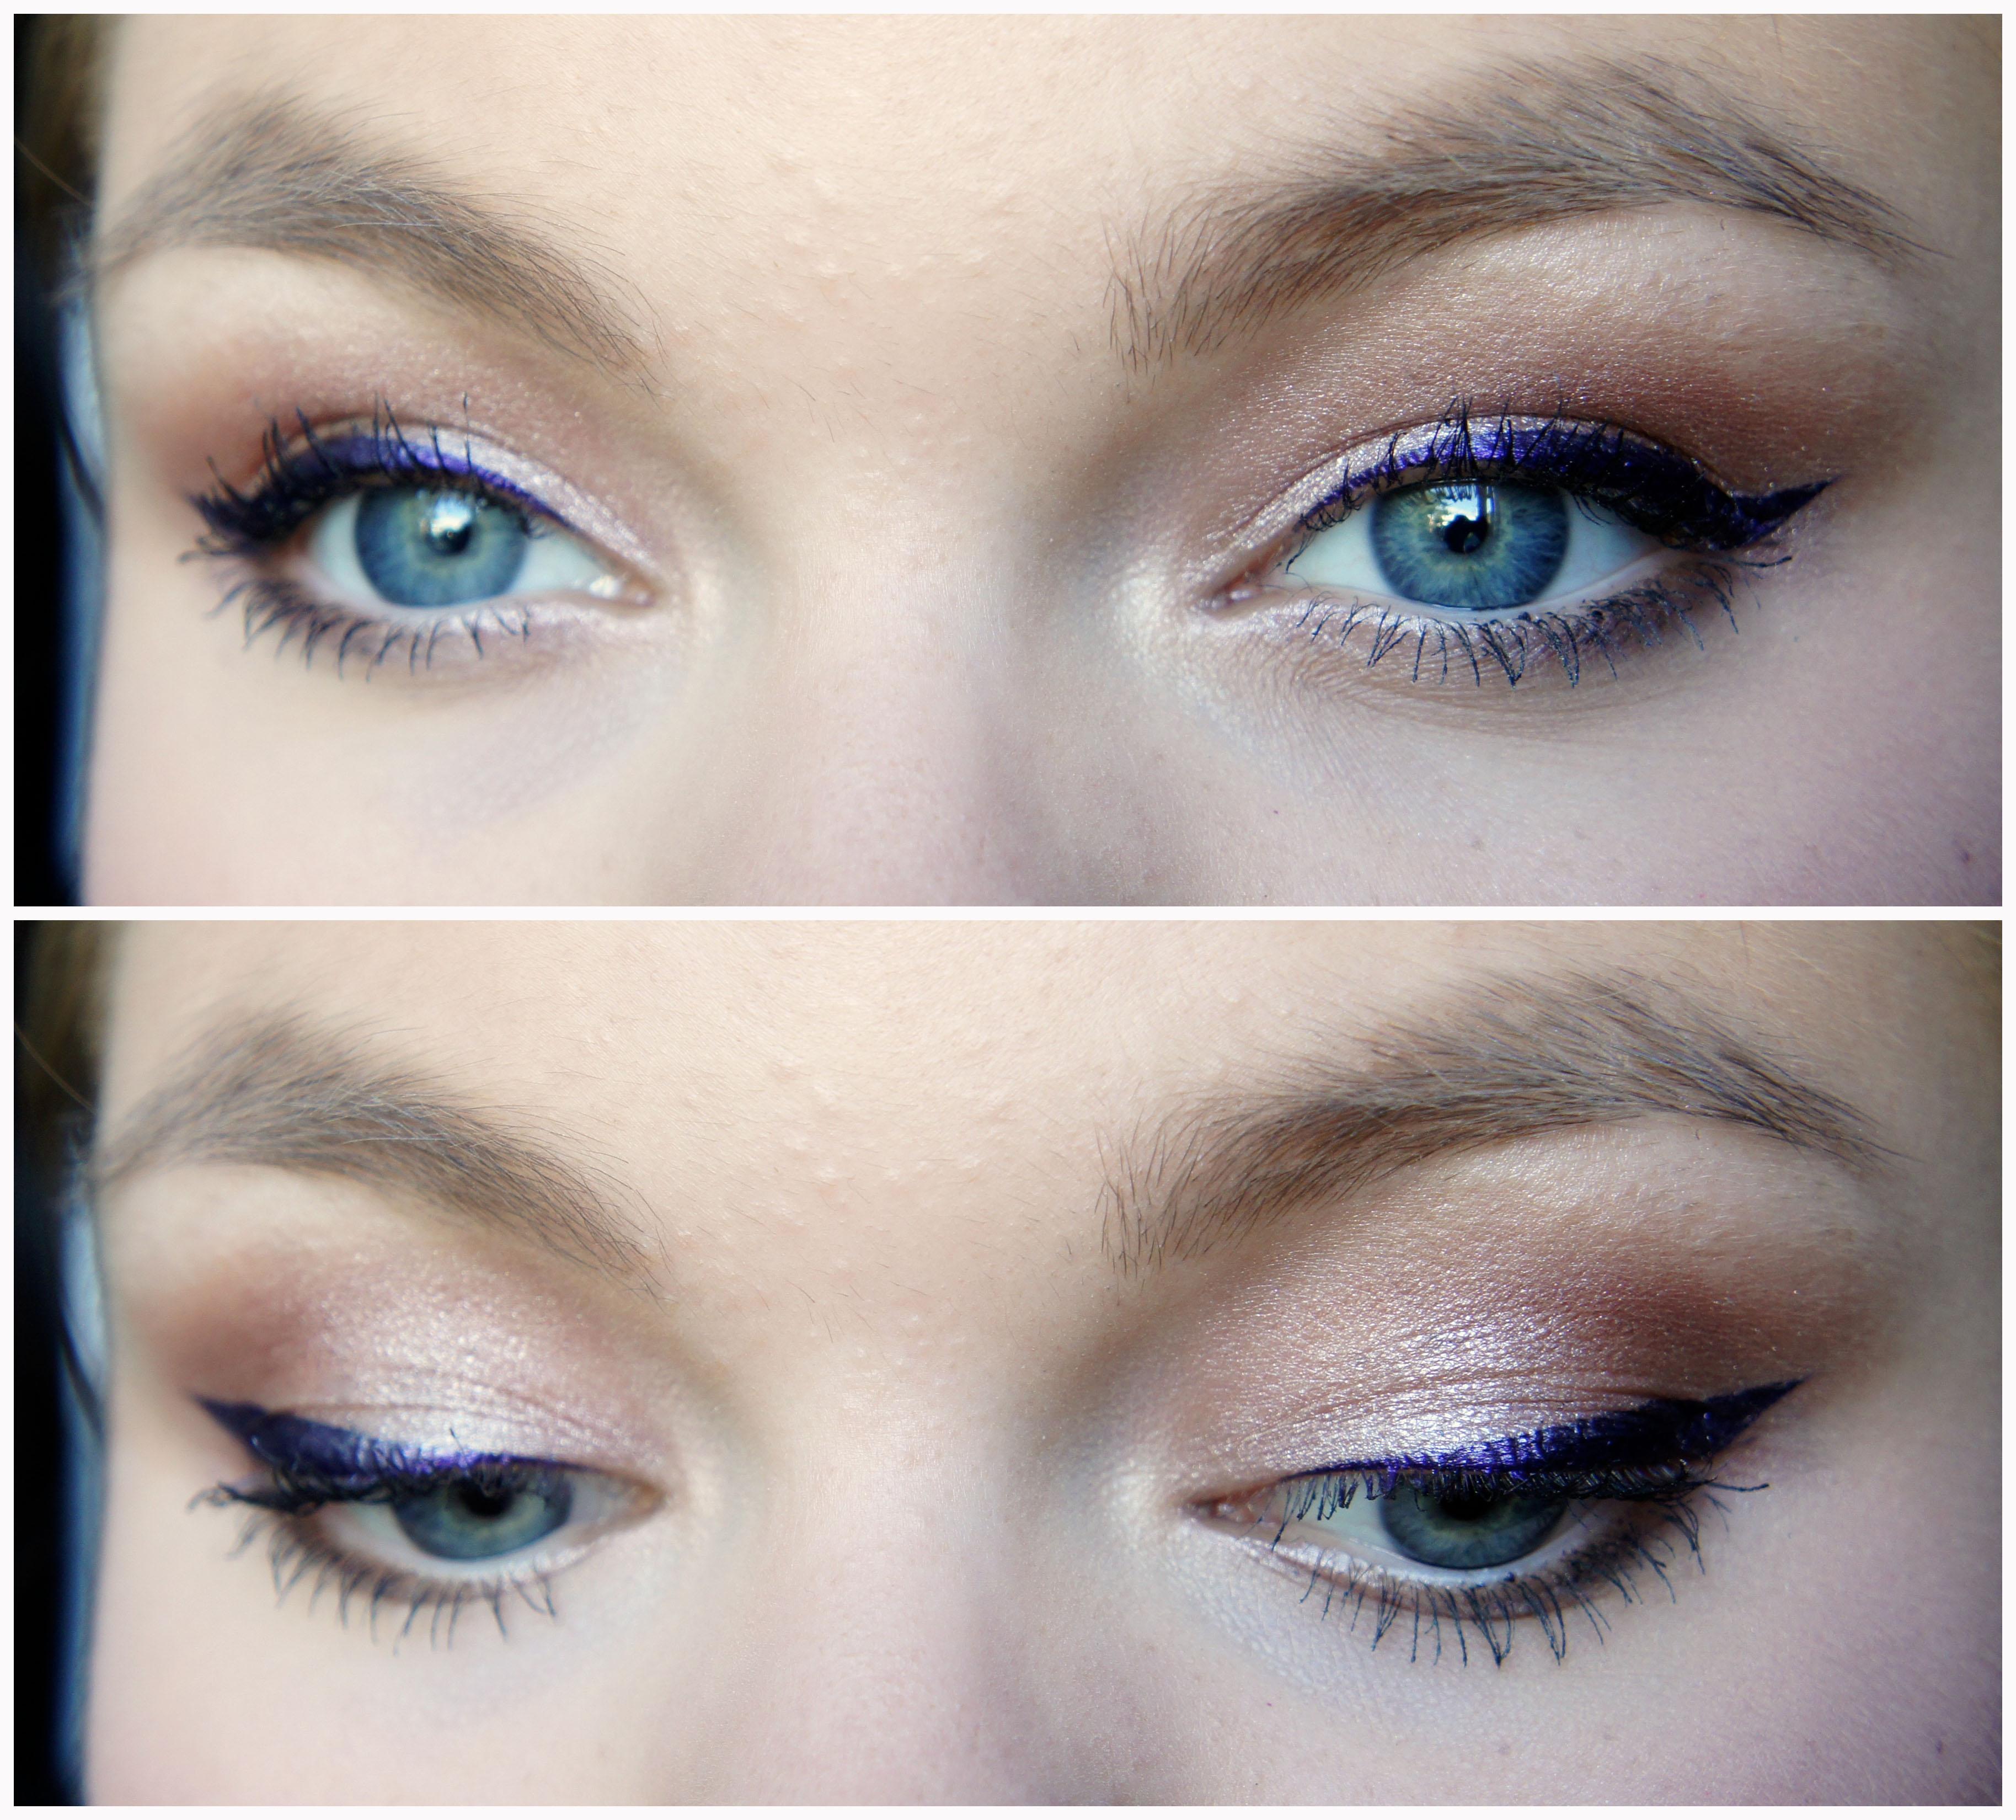 Purpleliner2